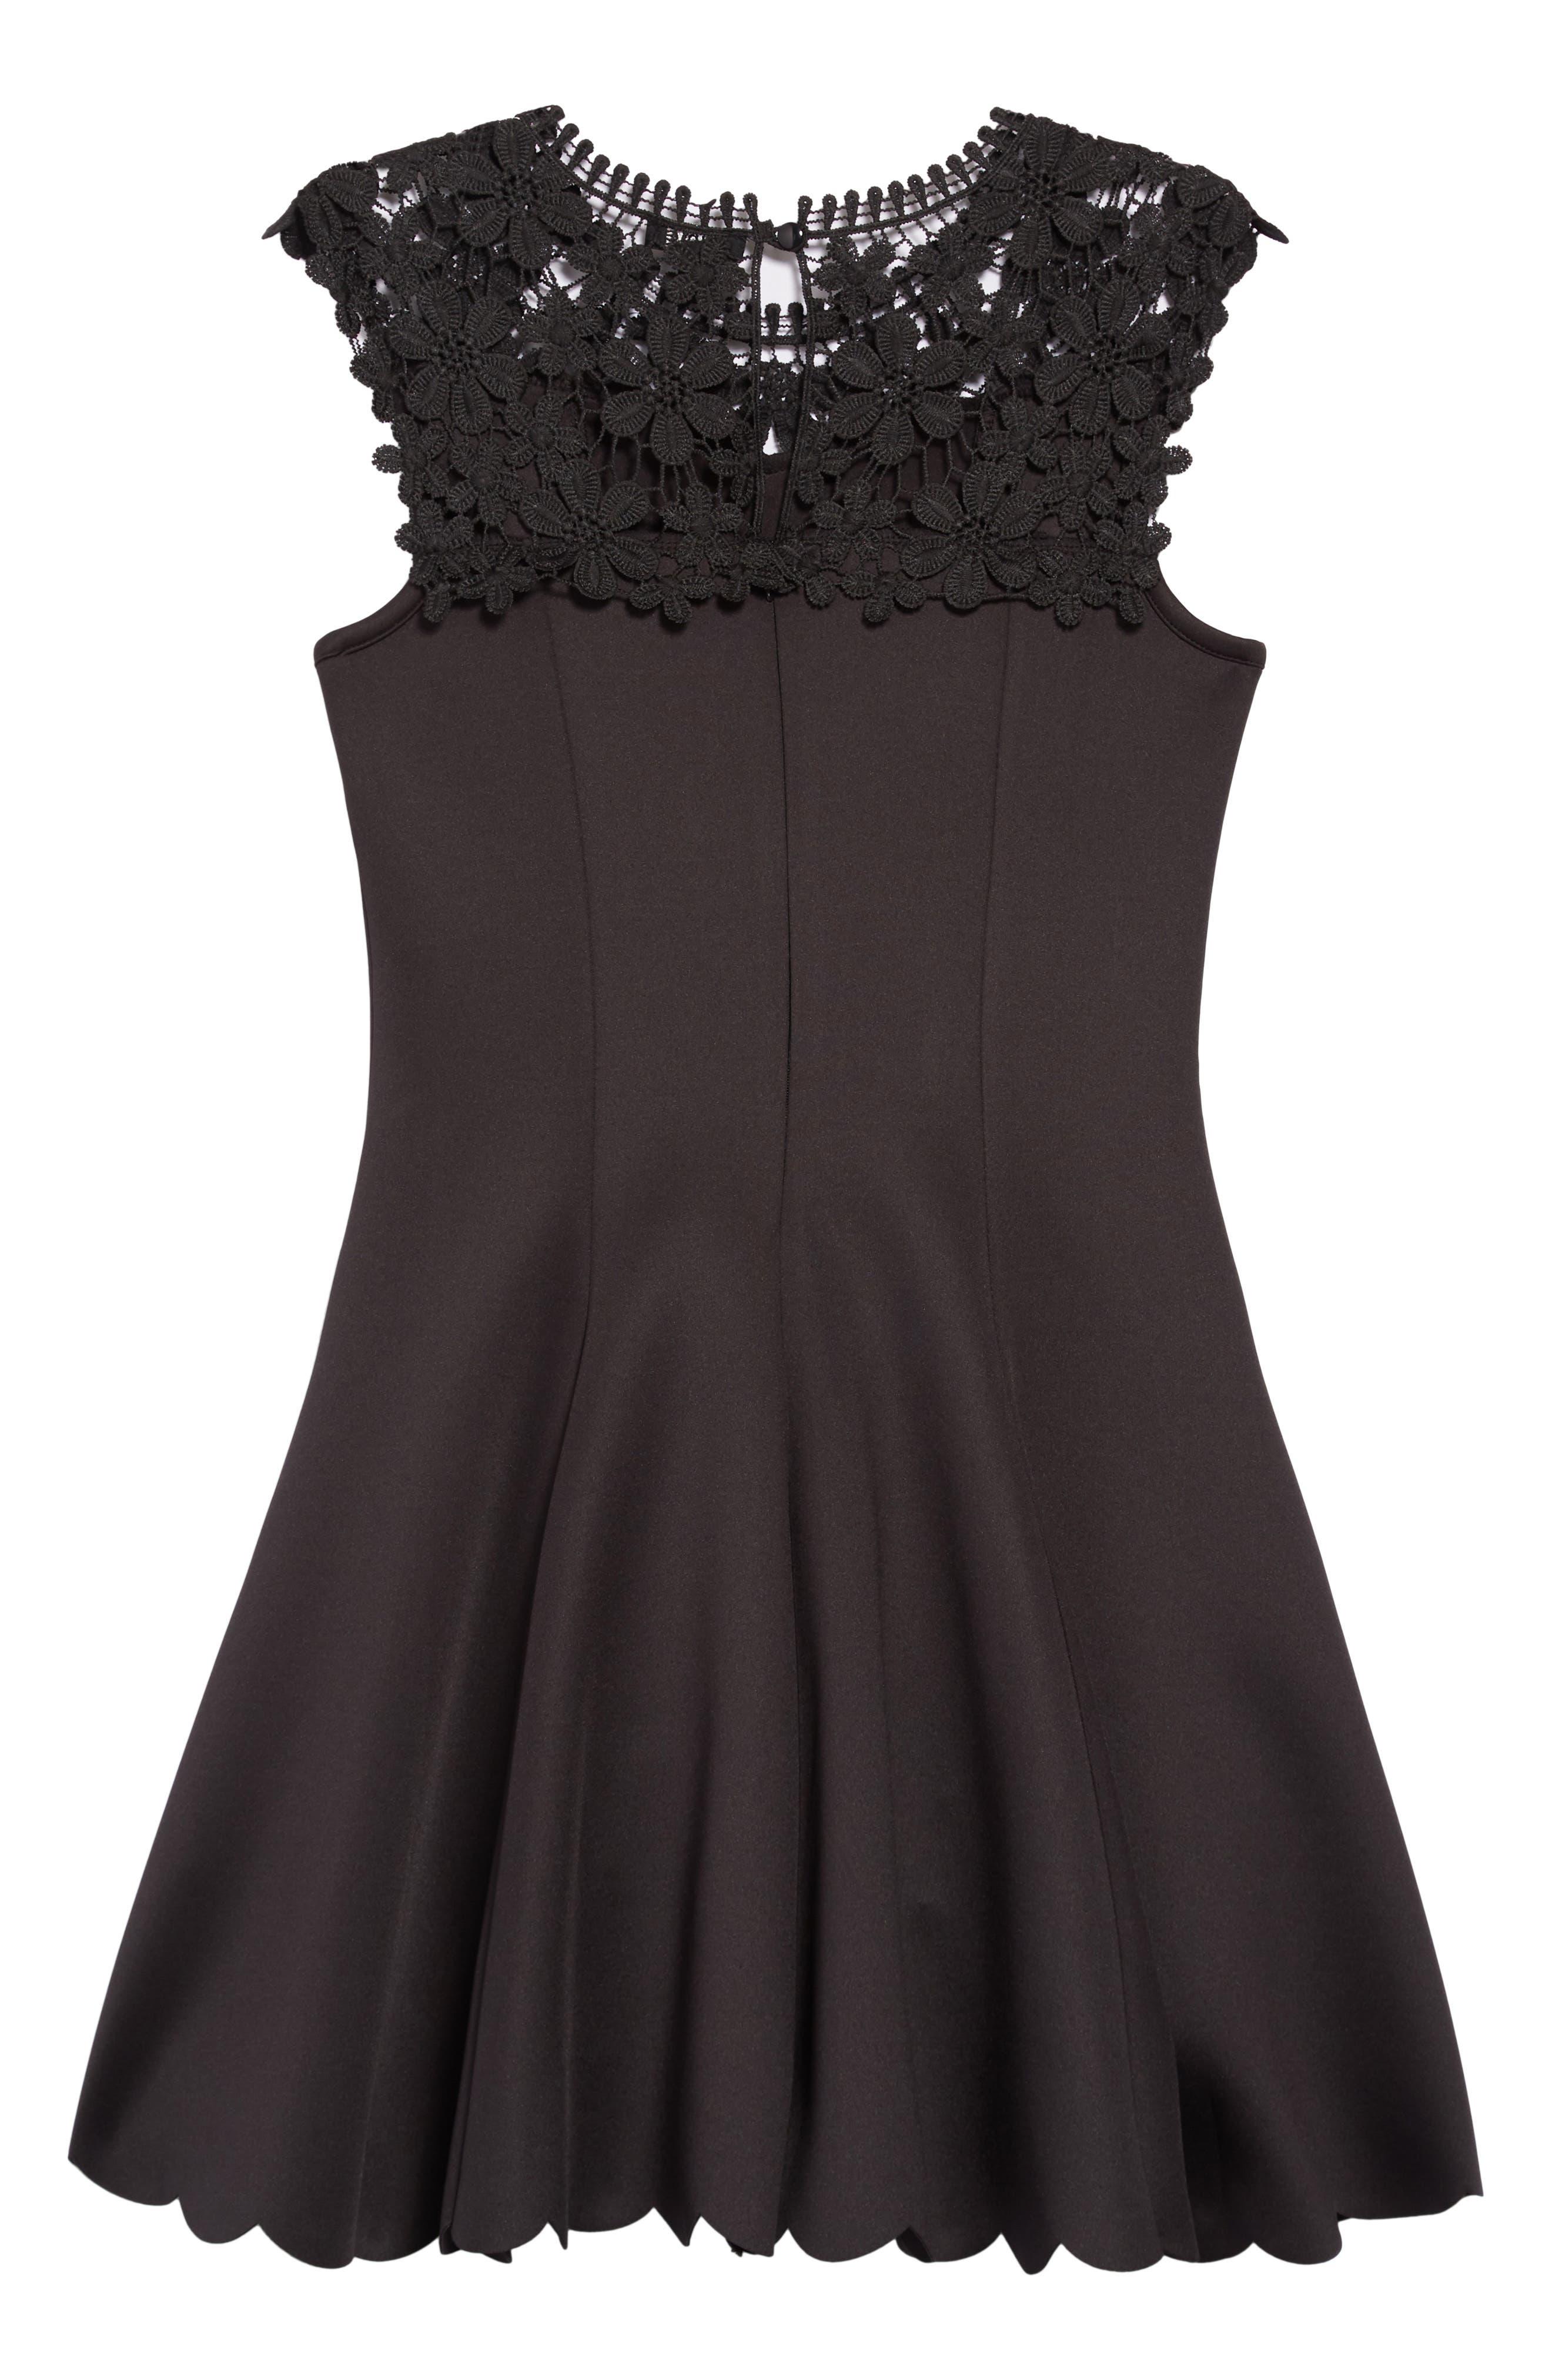 Floral Lace Skater Dress,                             Alternate thumbnail 2, color,                             BLACK